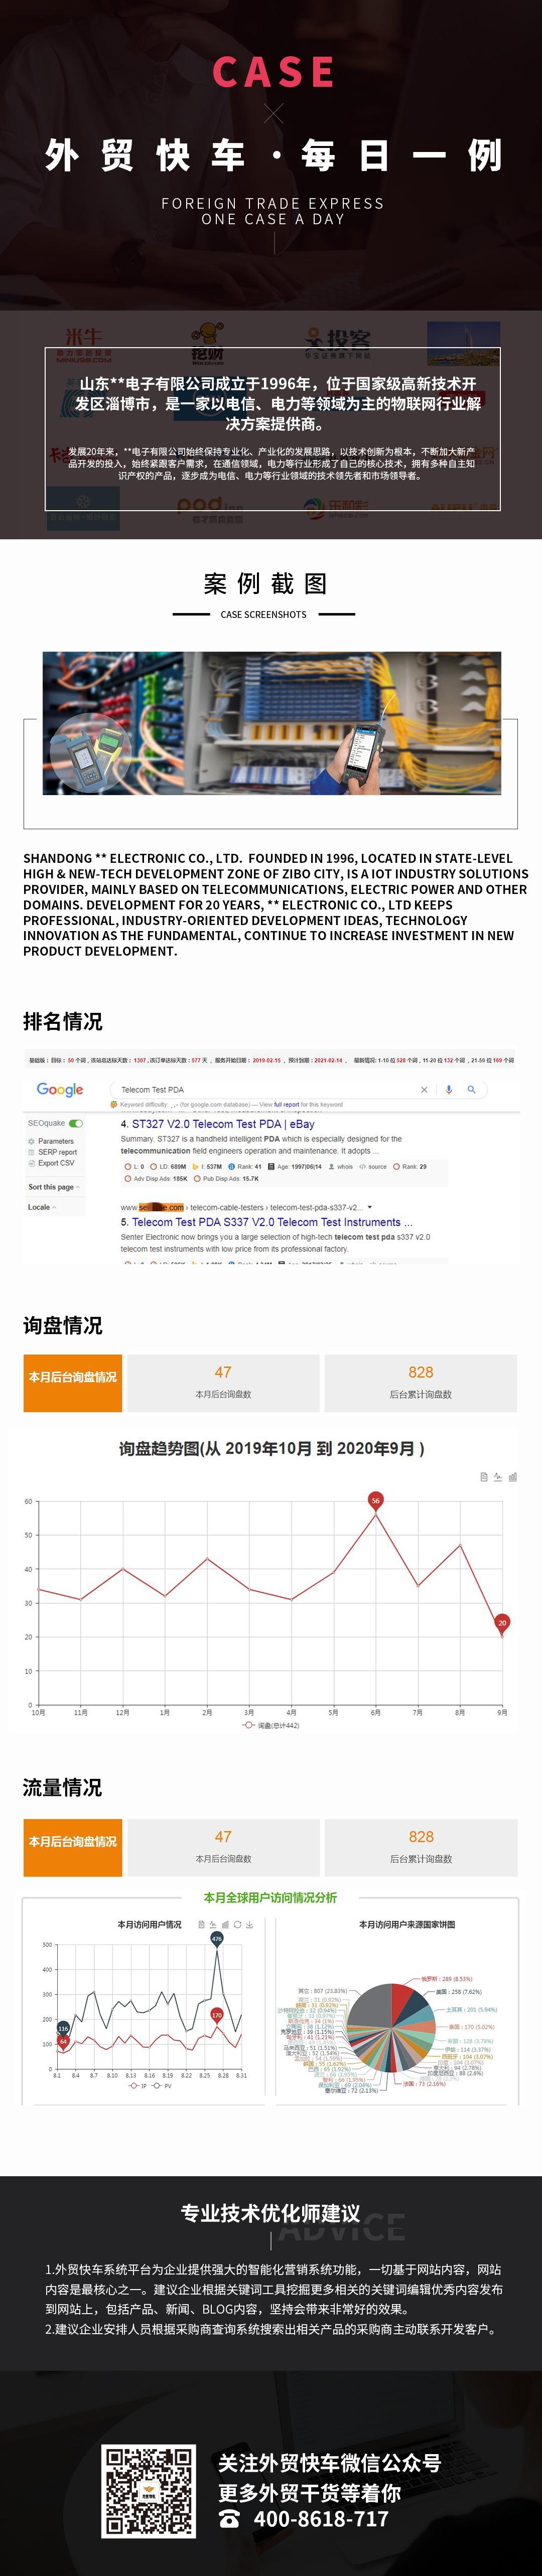 Google优化|工业PDA外贸推广案例展示-外贸快车